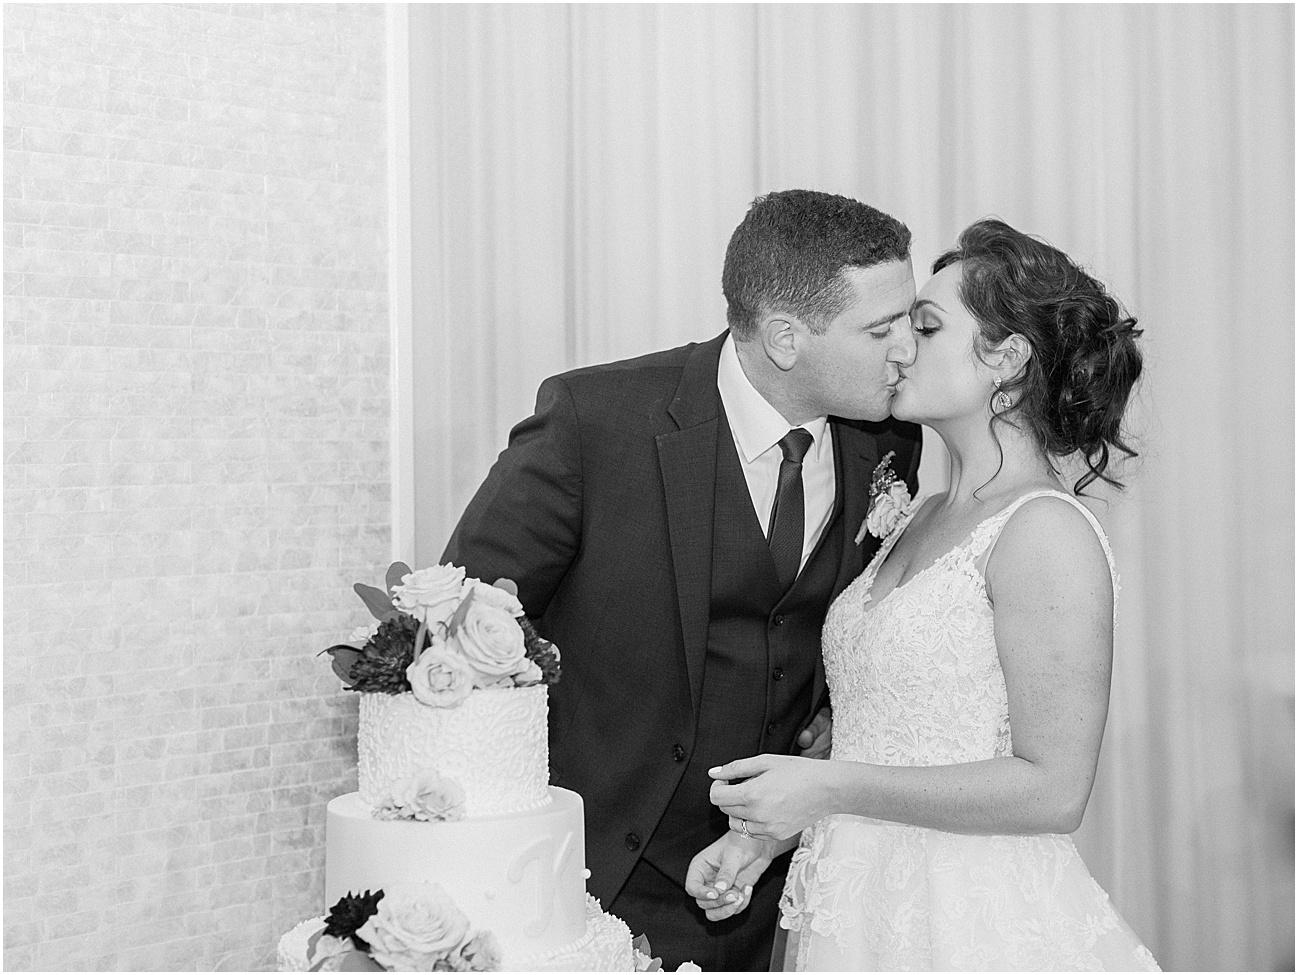 shannon_daniel_dan_atlantic_resort_saint_marys_st_mary_church_fall_newport_catholic_irish_cape_cod_boston_wedding_photographer_meredith_jane_photography_photo_1651.jpg